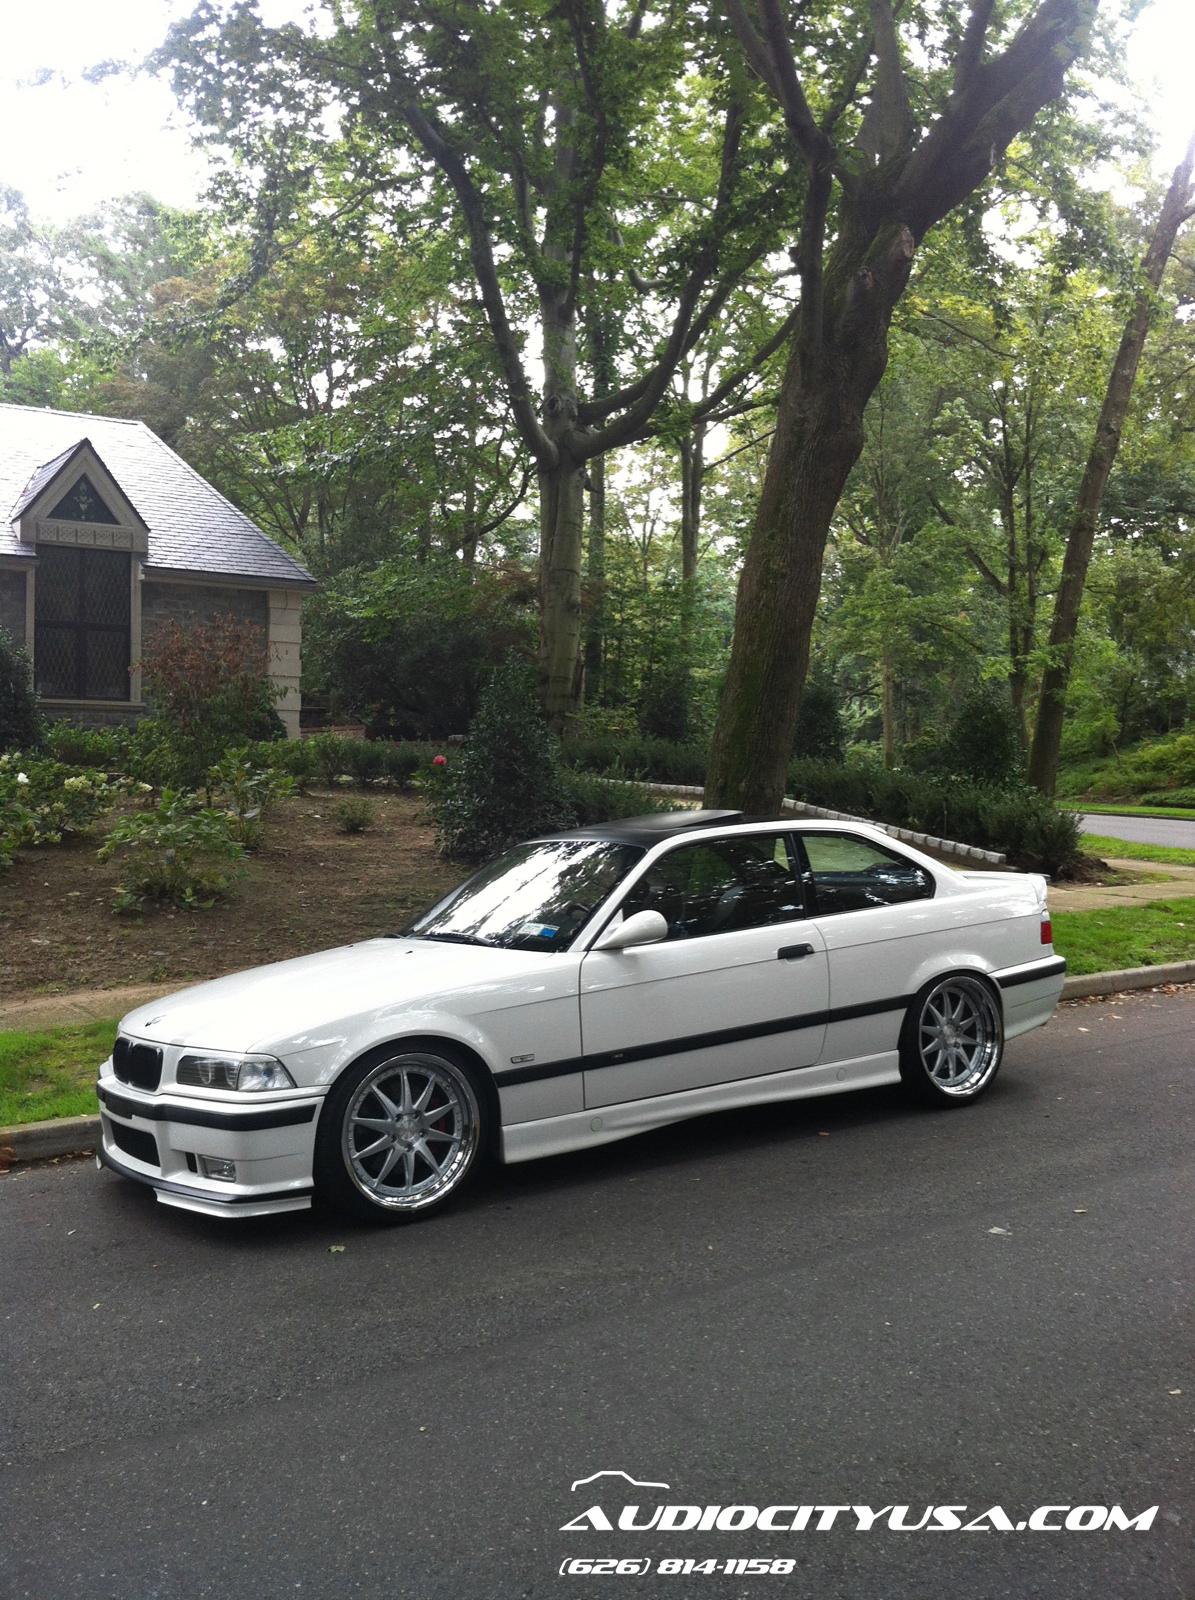 1997 E36 BMW M3 On 19 Rennen CSL 1 Brush Face Chrome Lip